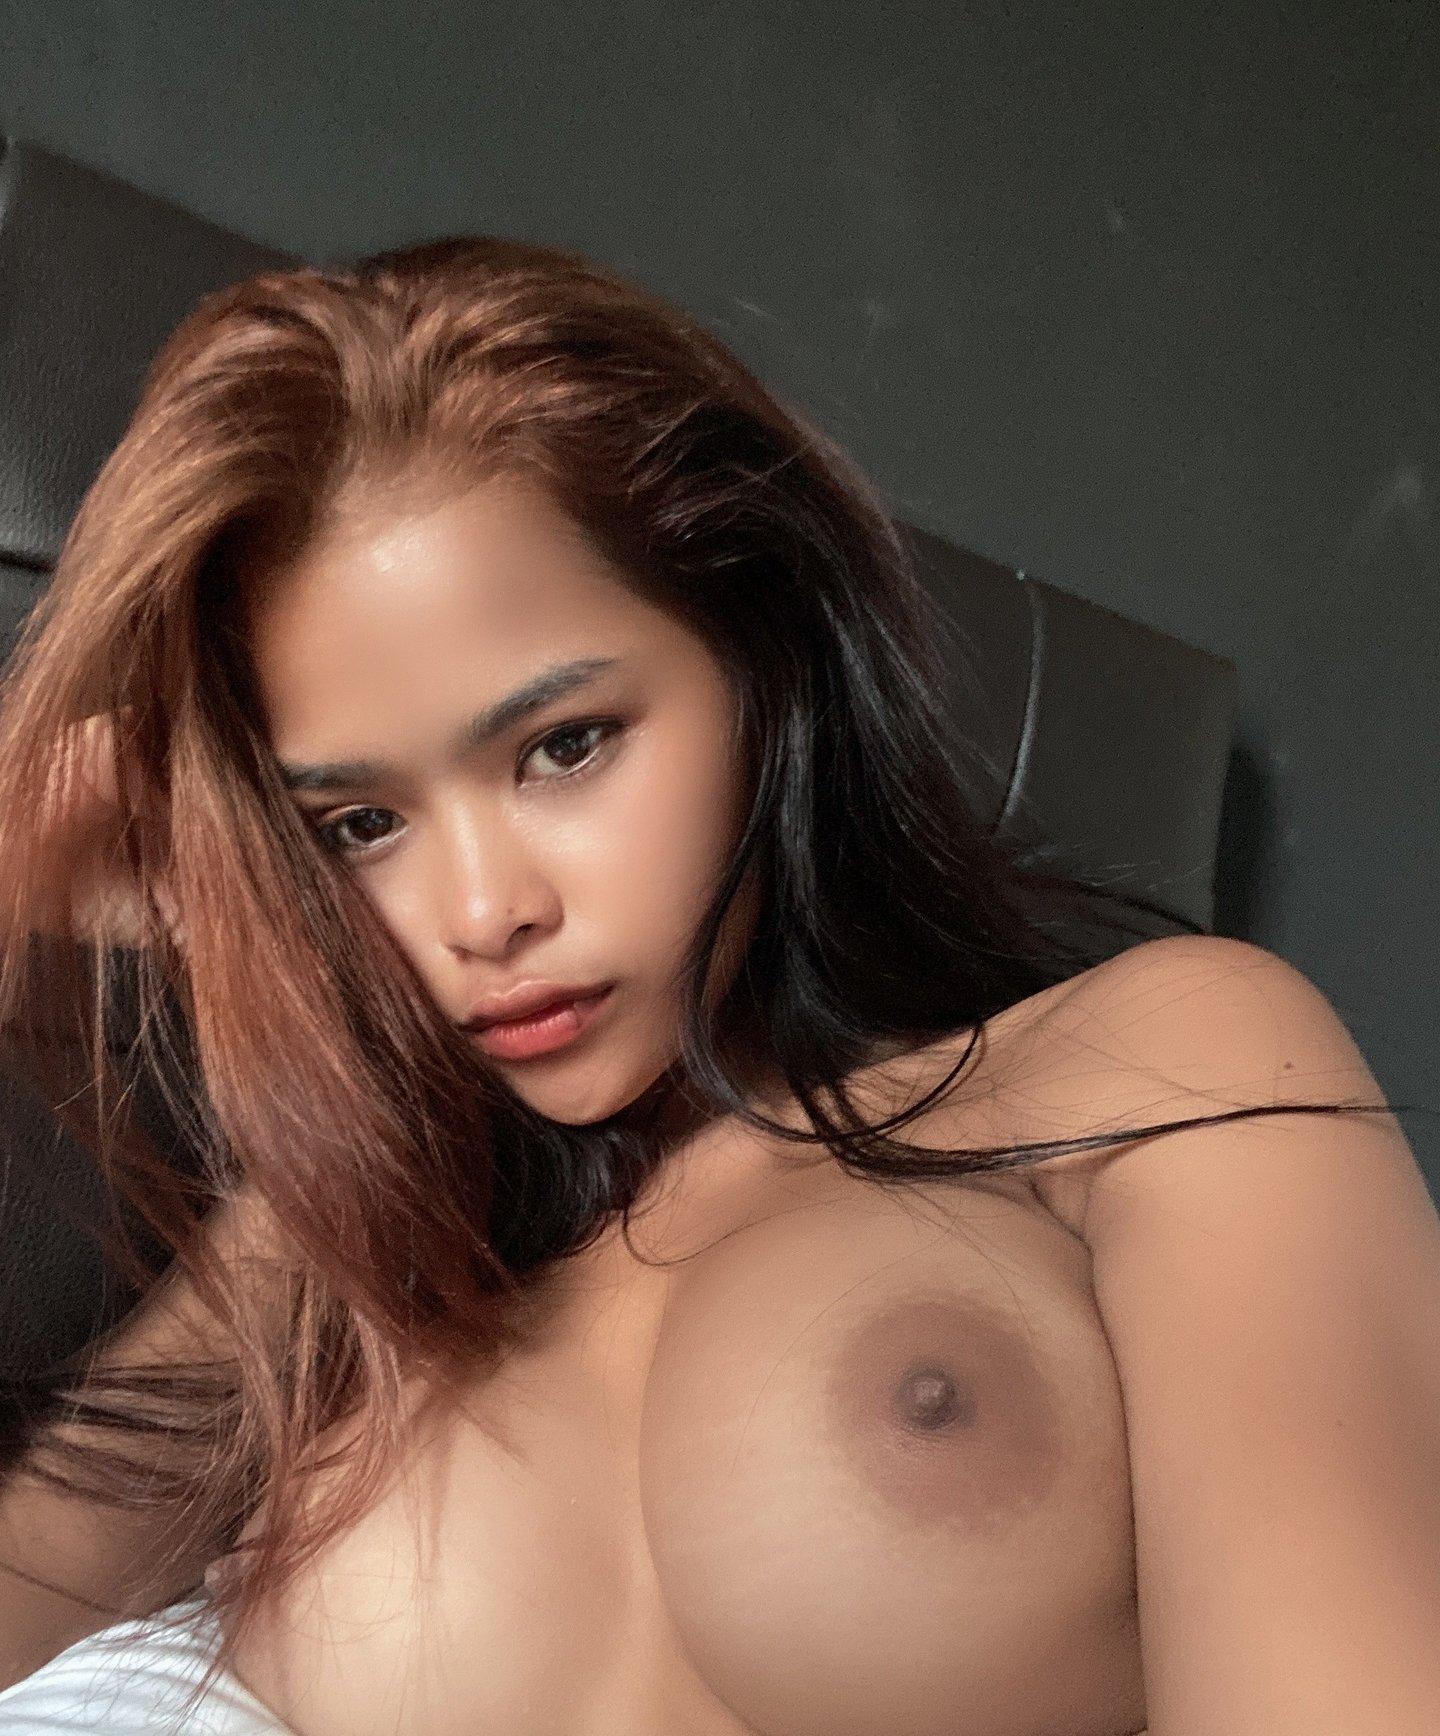 Chloe Choleboo Onlyfans Nude Leaks 0036